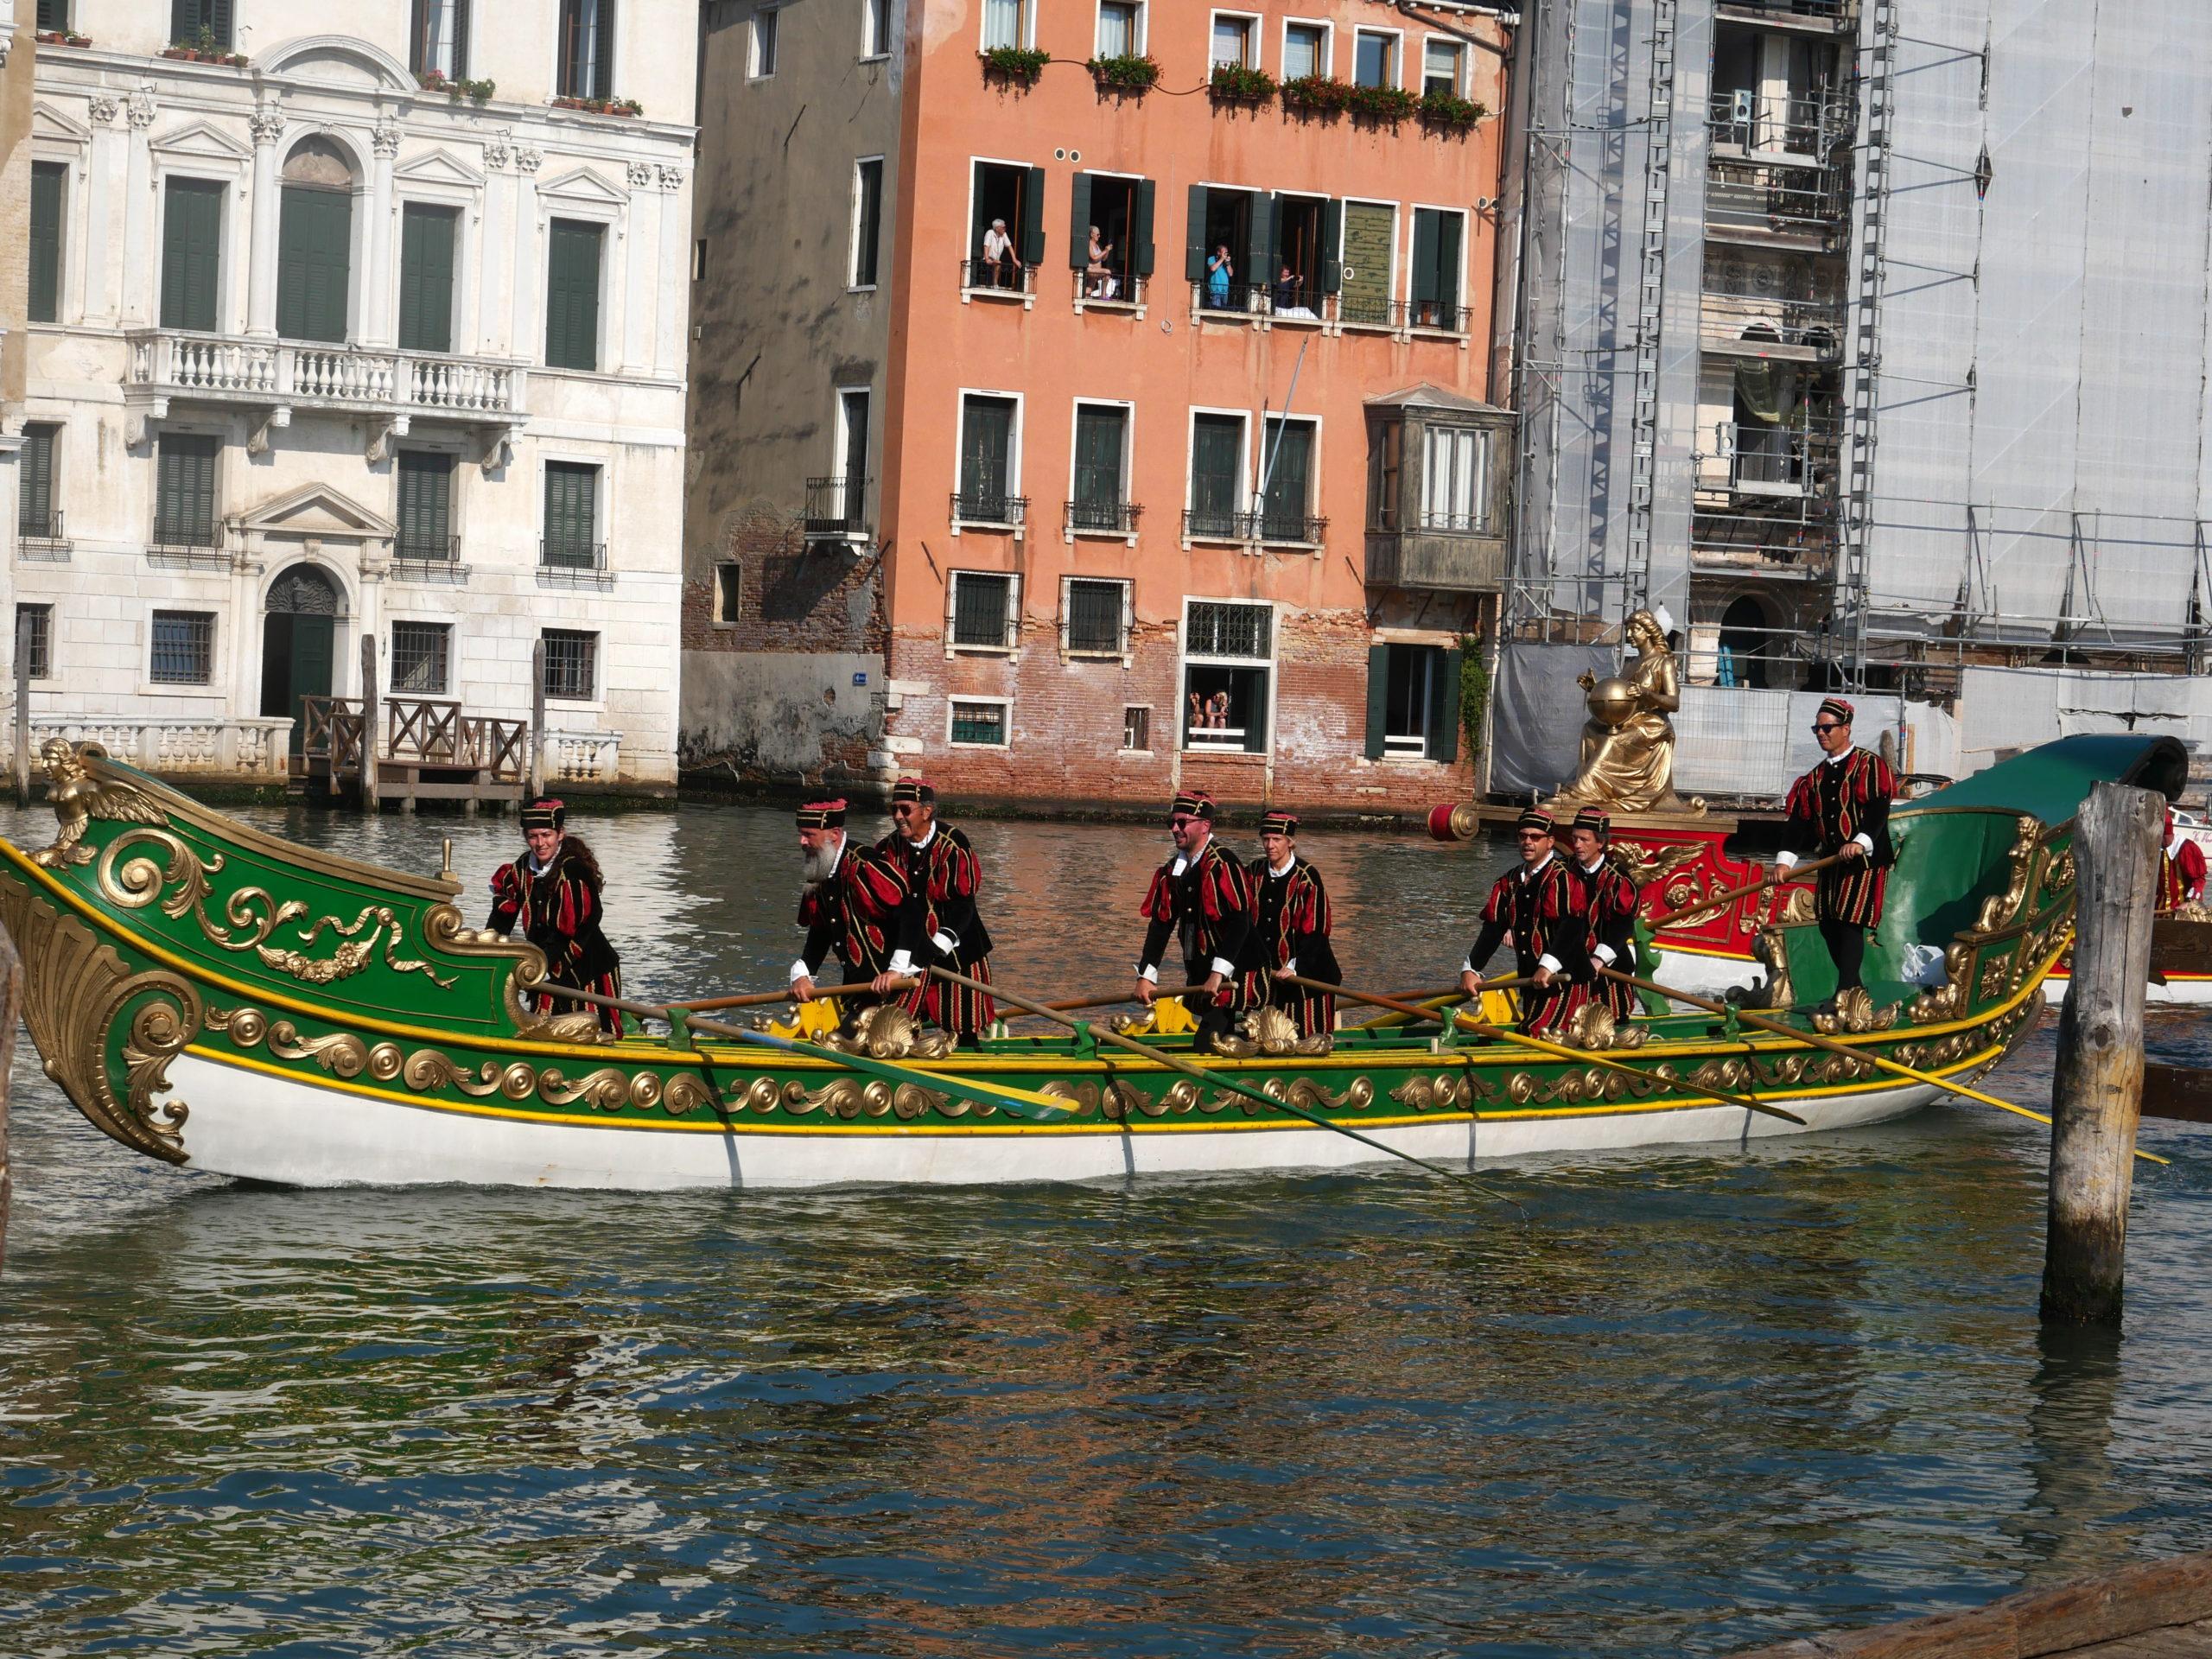 bateau Regata Storica Venise